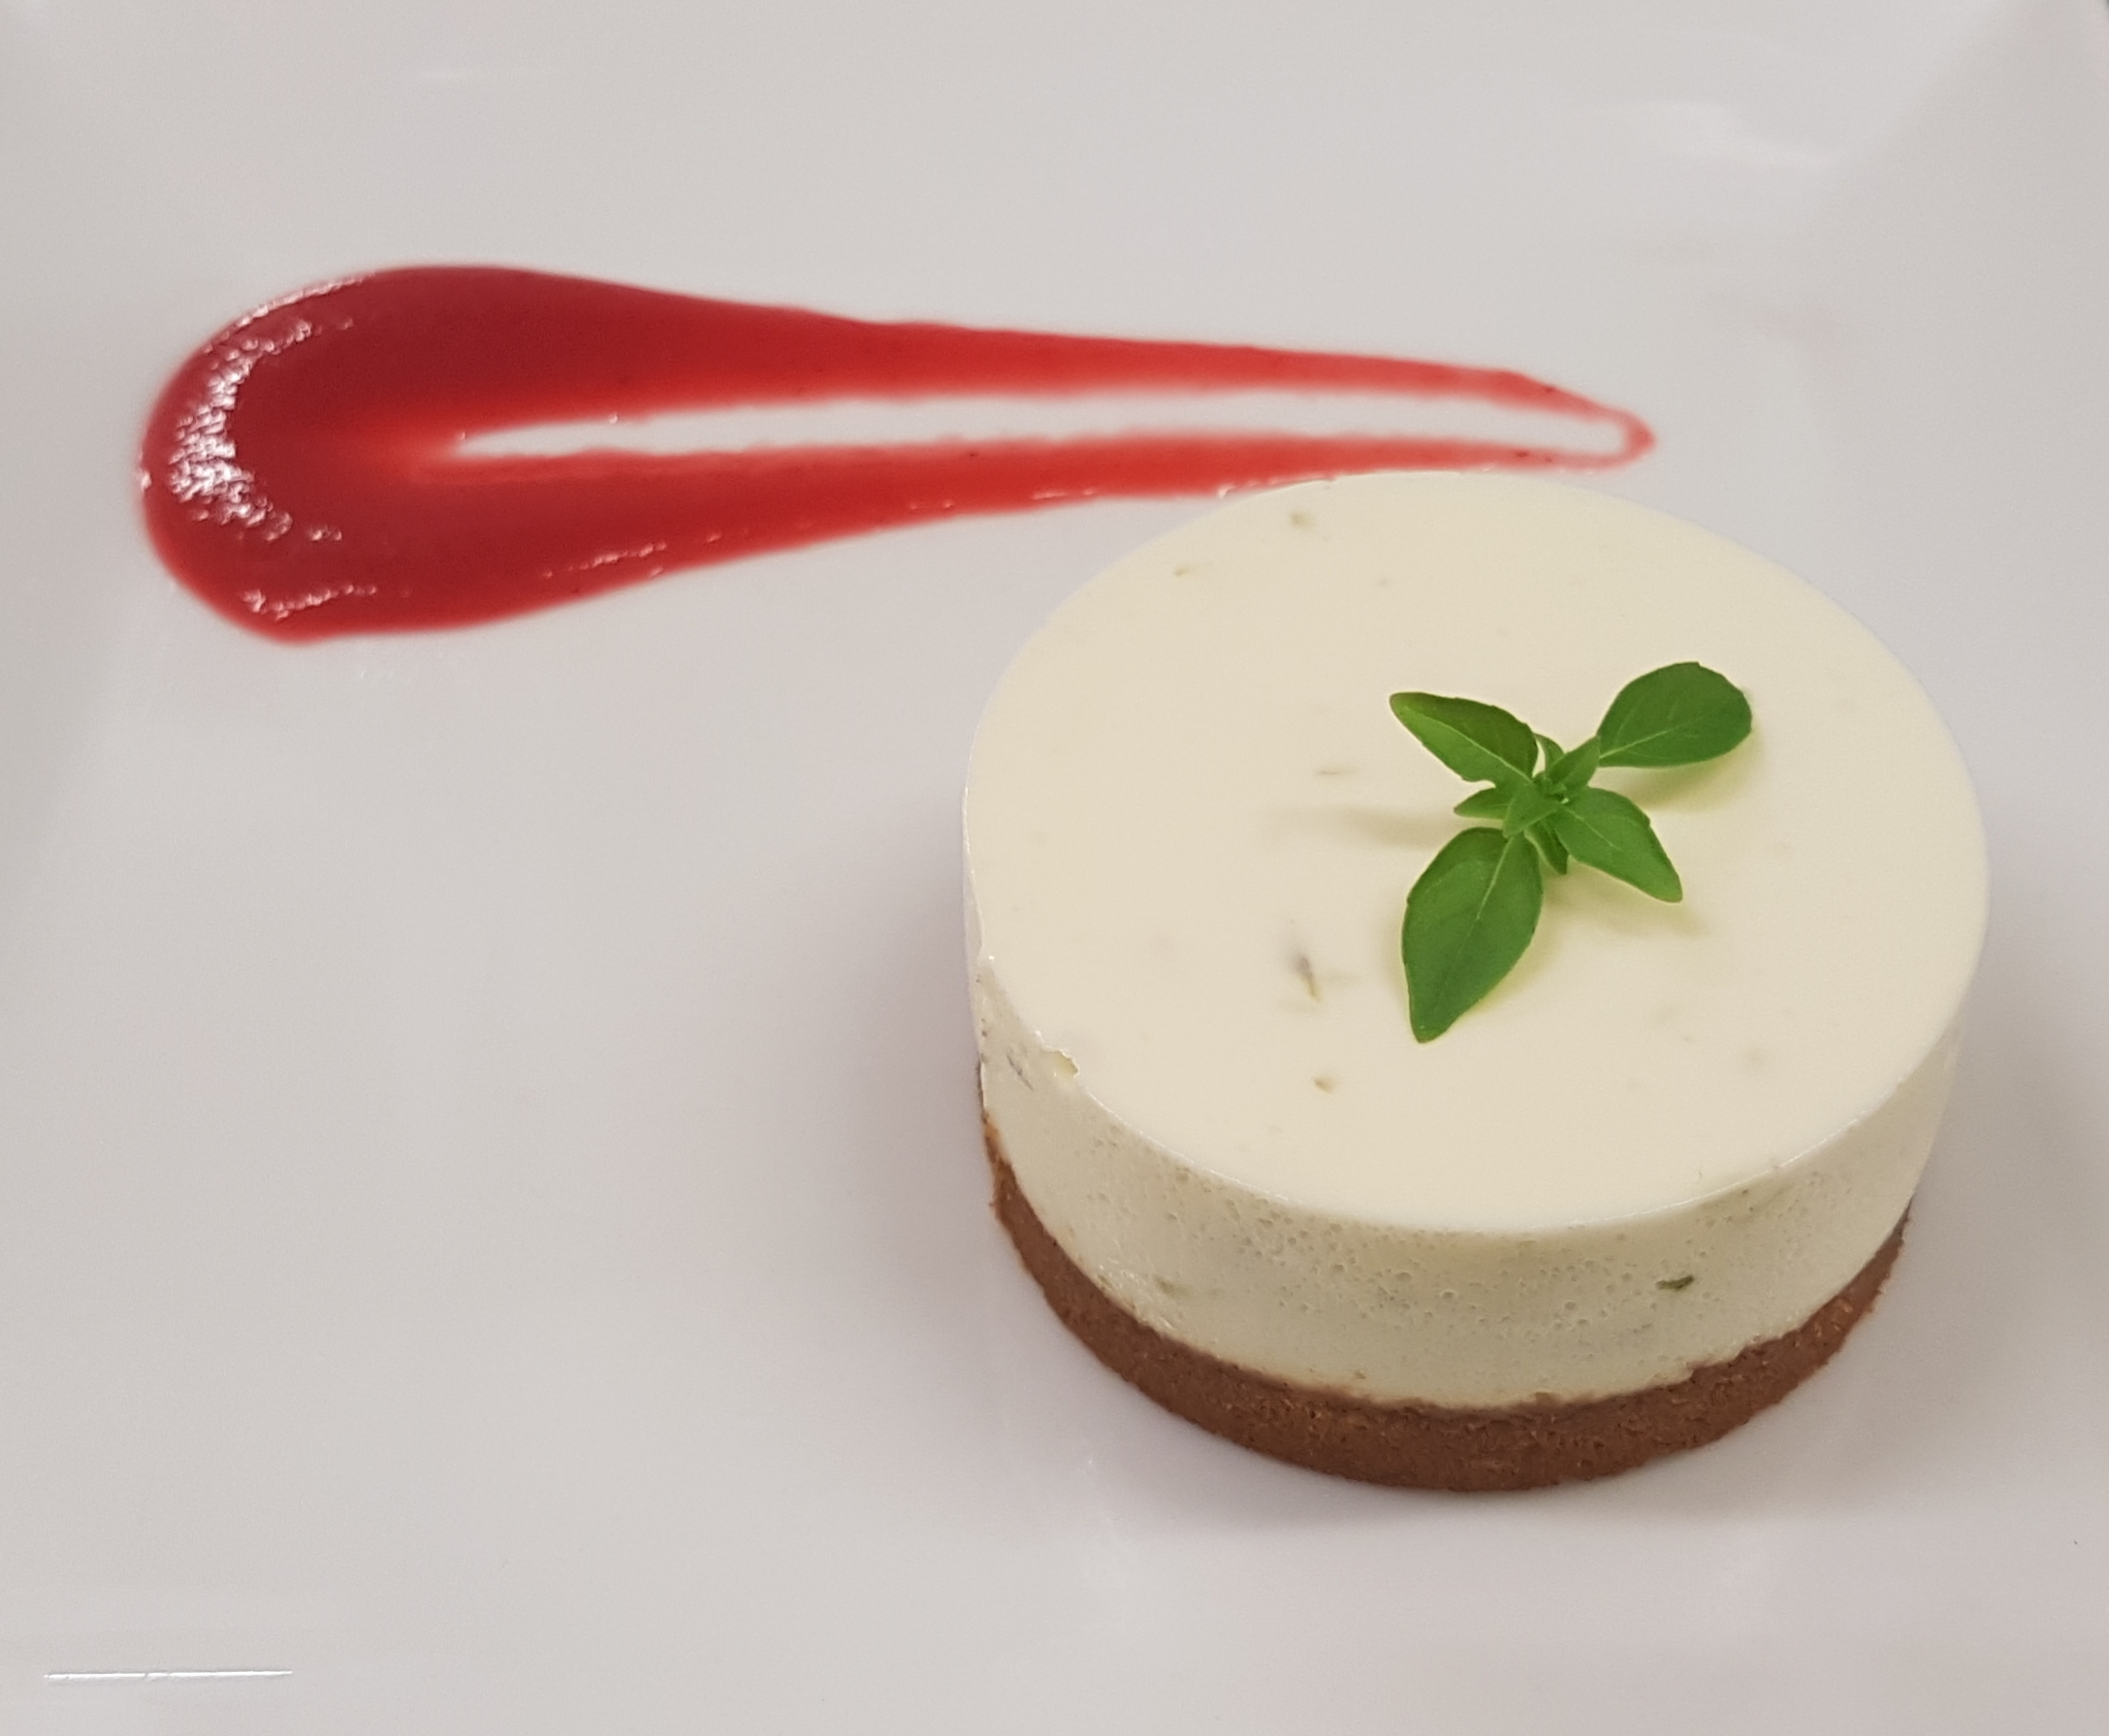 Cheesecake citron vert et spéculoos - 2019